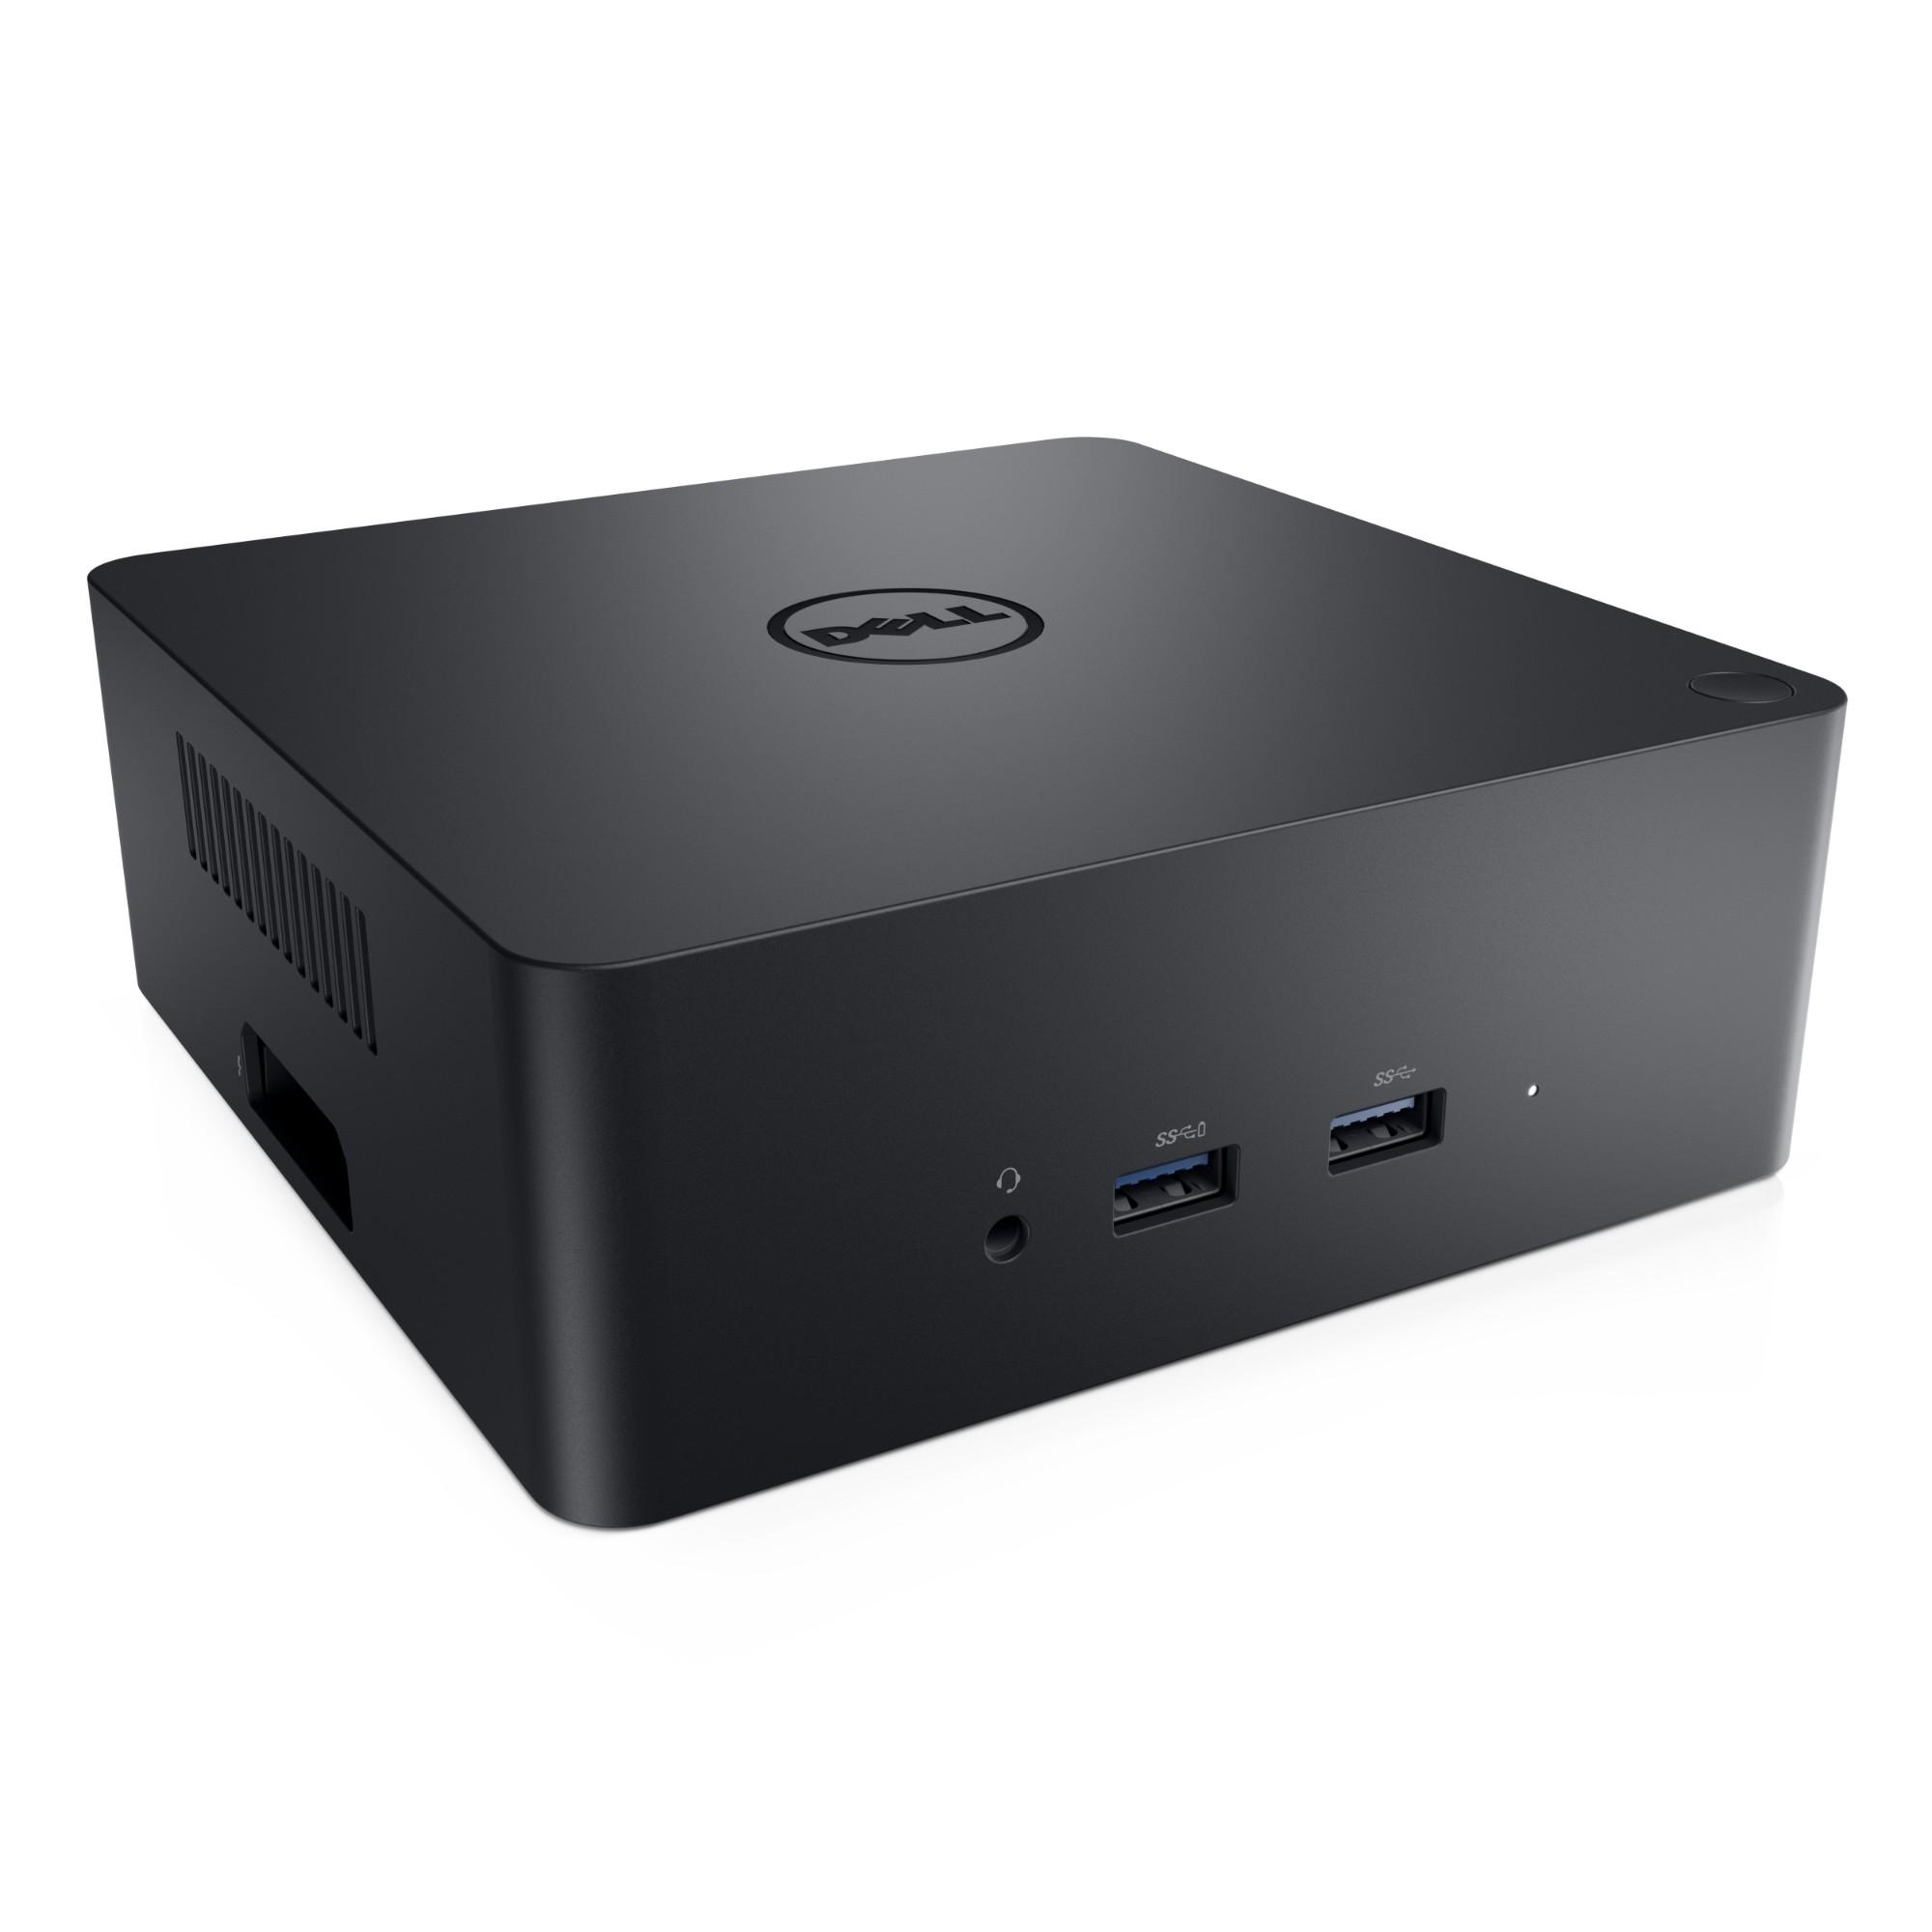 DELL TB18DC Wired USB 3.0 (3.1 Gen 1) Type-B Black